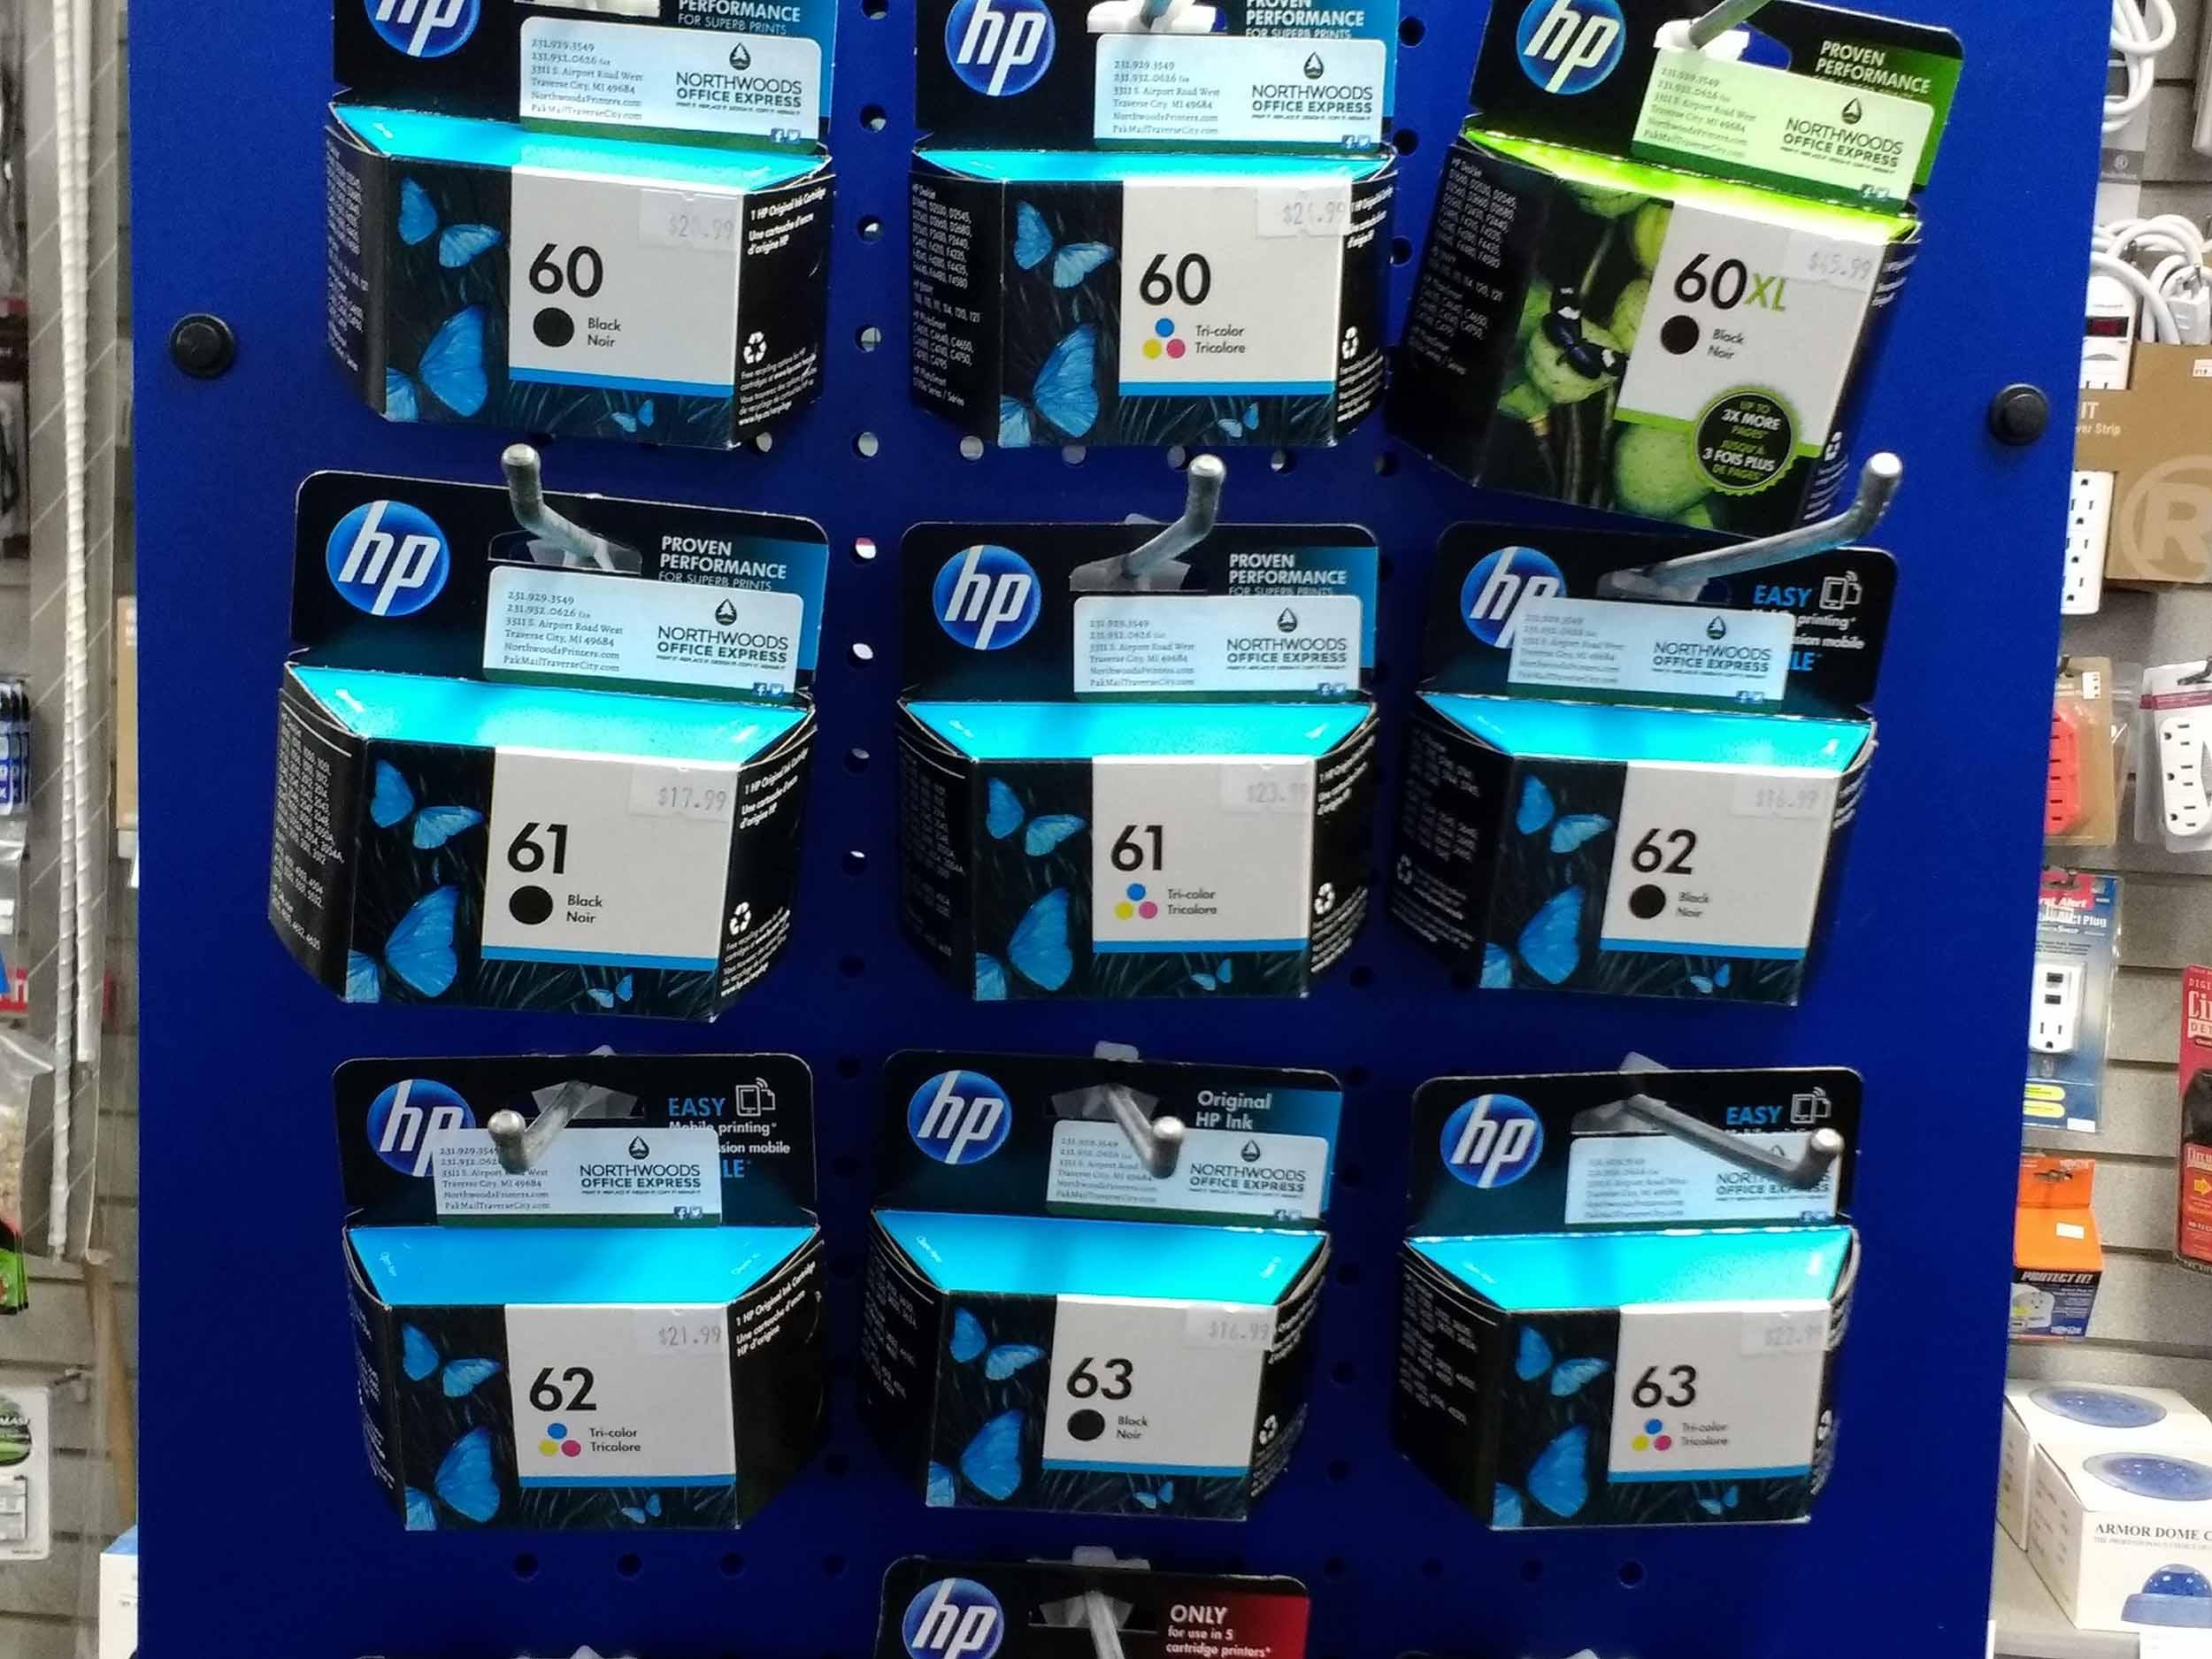 Name brand printer cartridges